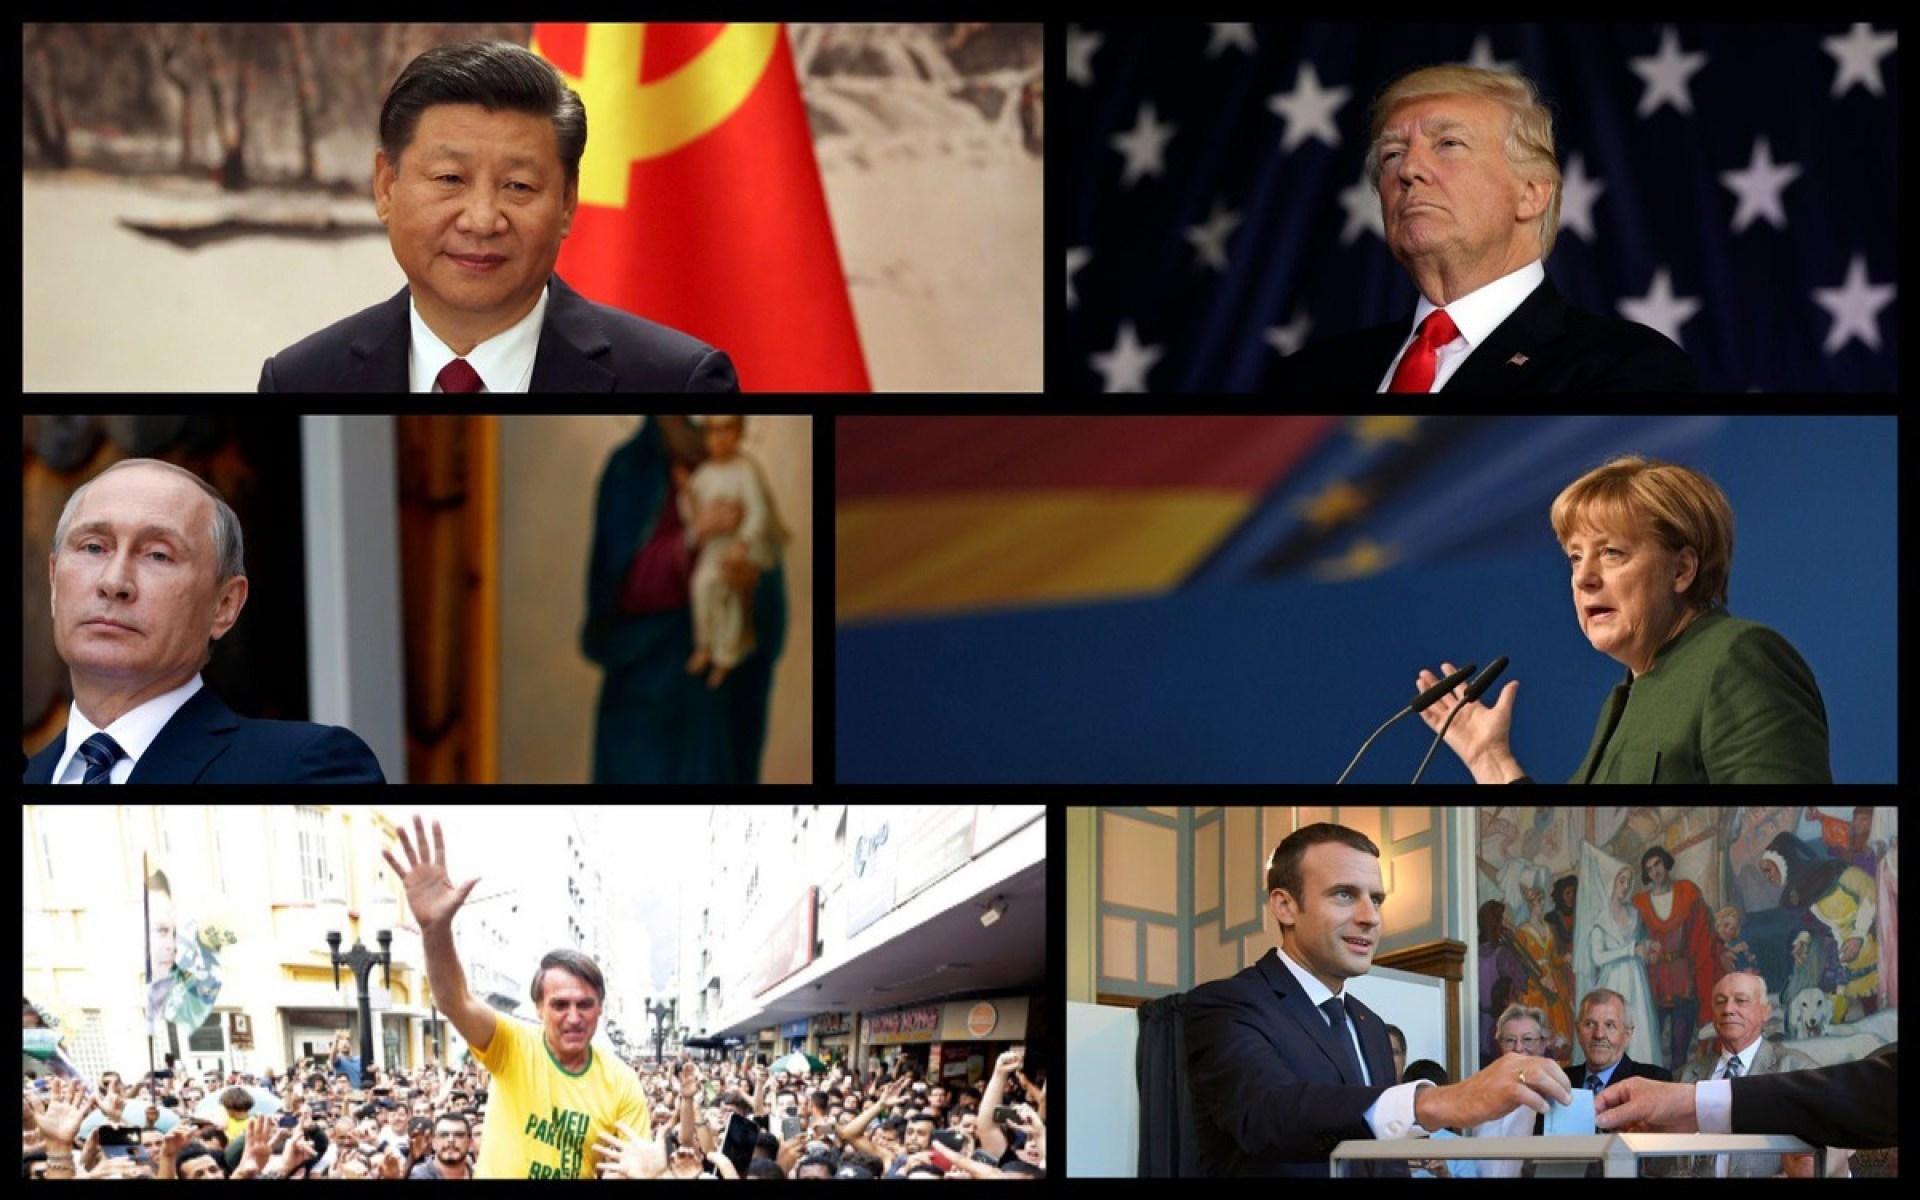 From Top Left: Chinese President Xi Jinping, US President Donald Trump, Russian President Vladimir Putin, German Chancellor Angela Merkel, Brazilian President-Elect Jair Bolsonaro, and French President Emmanuel Macron (Rantt Media/AP)